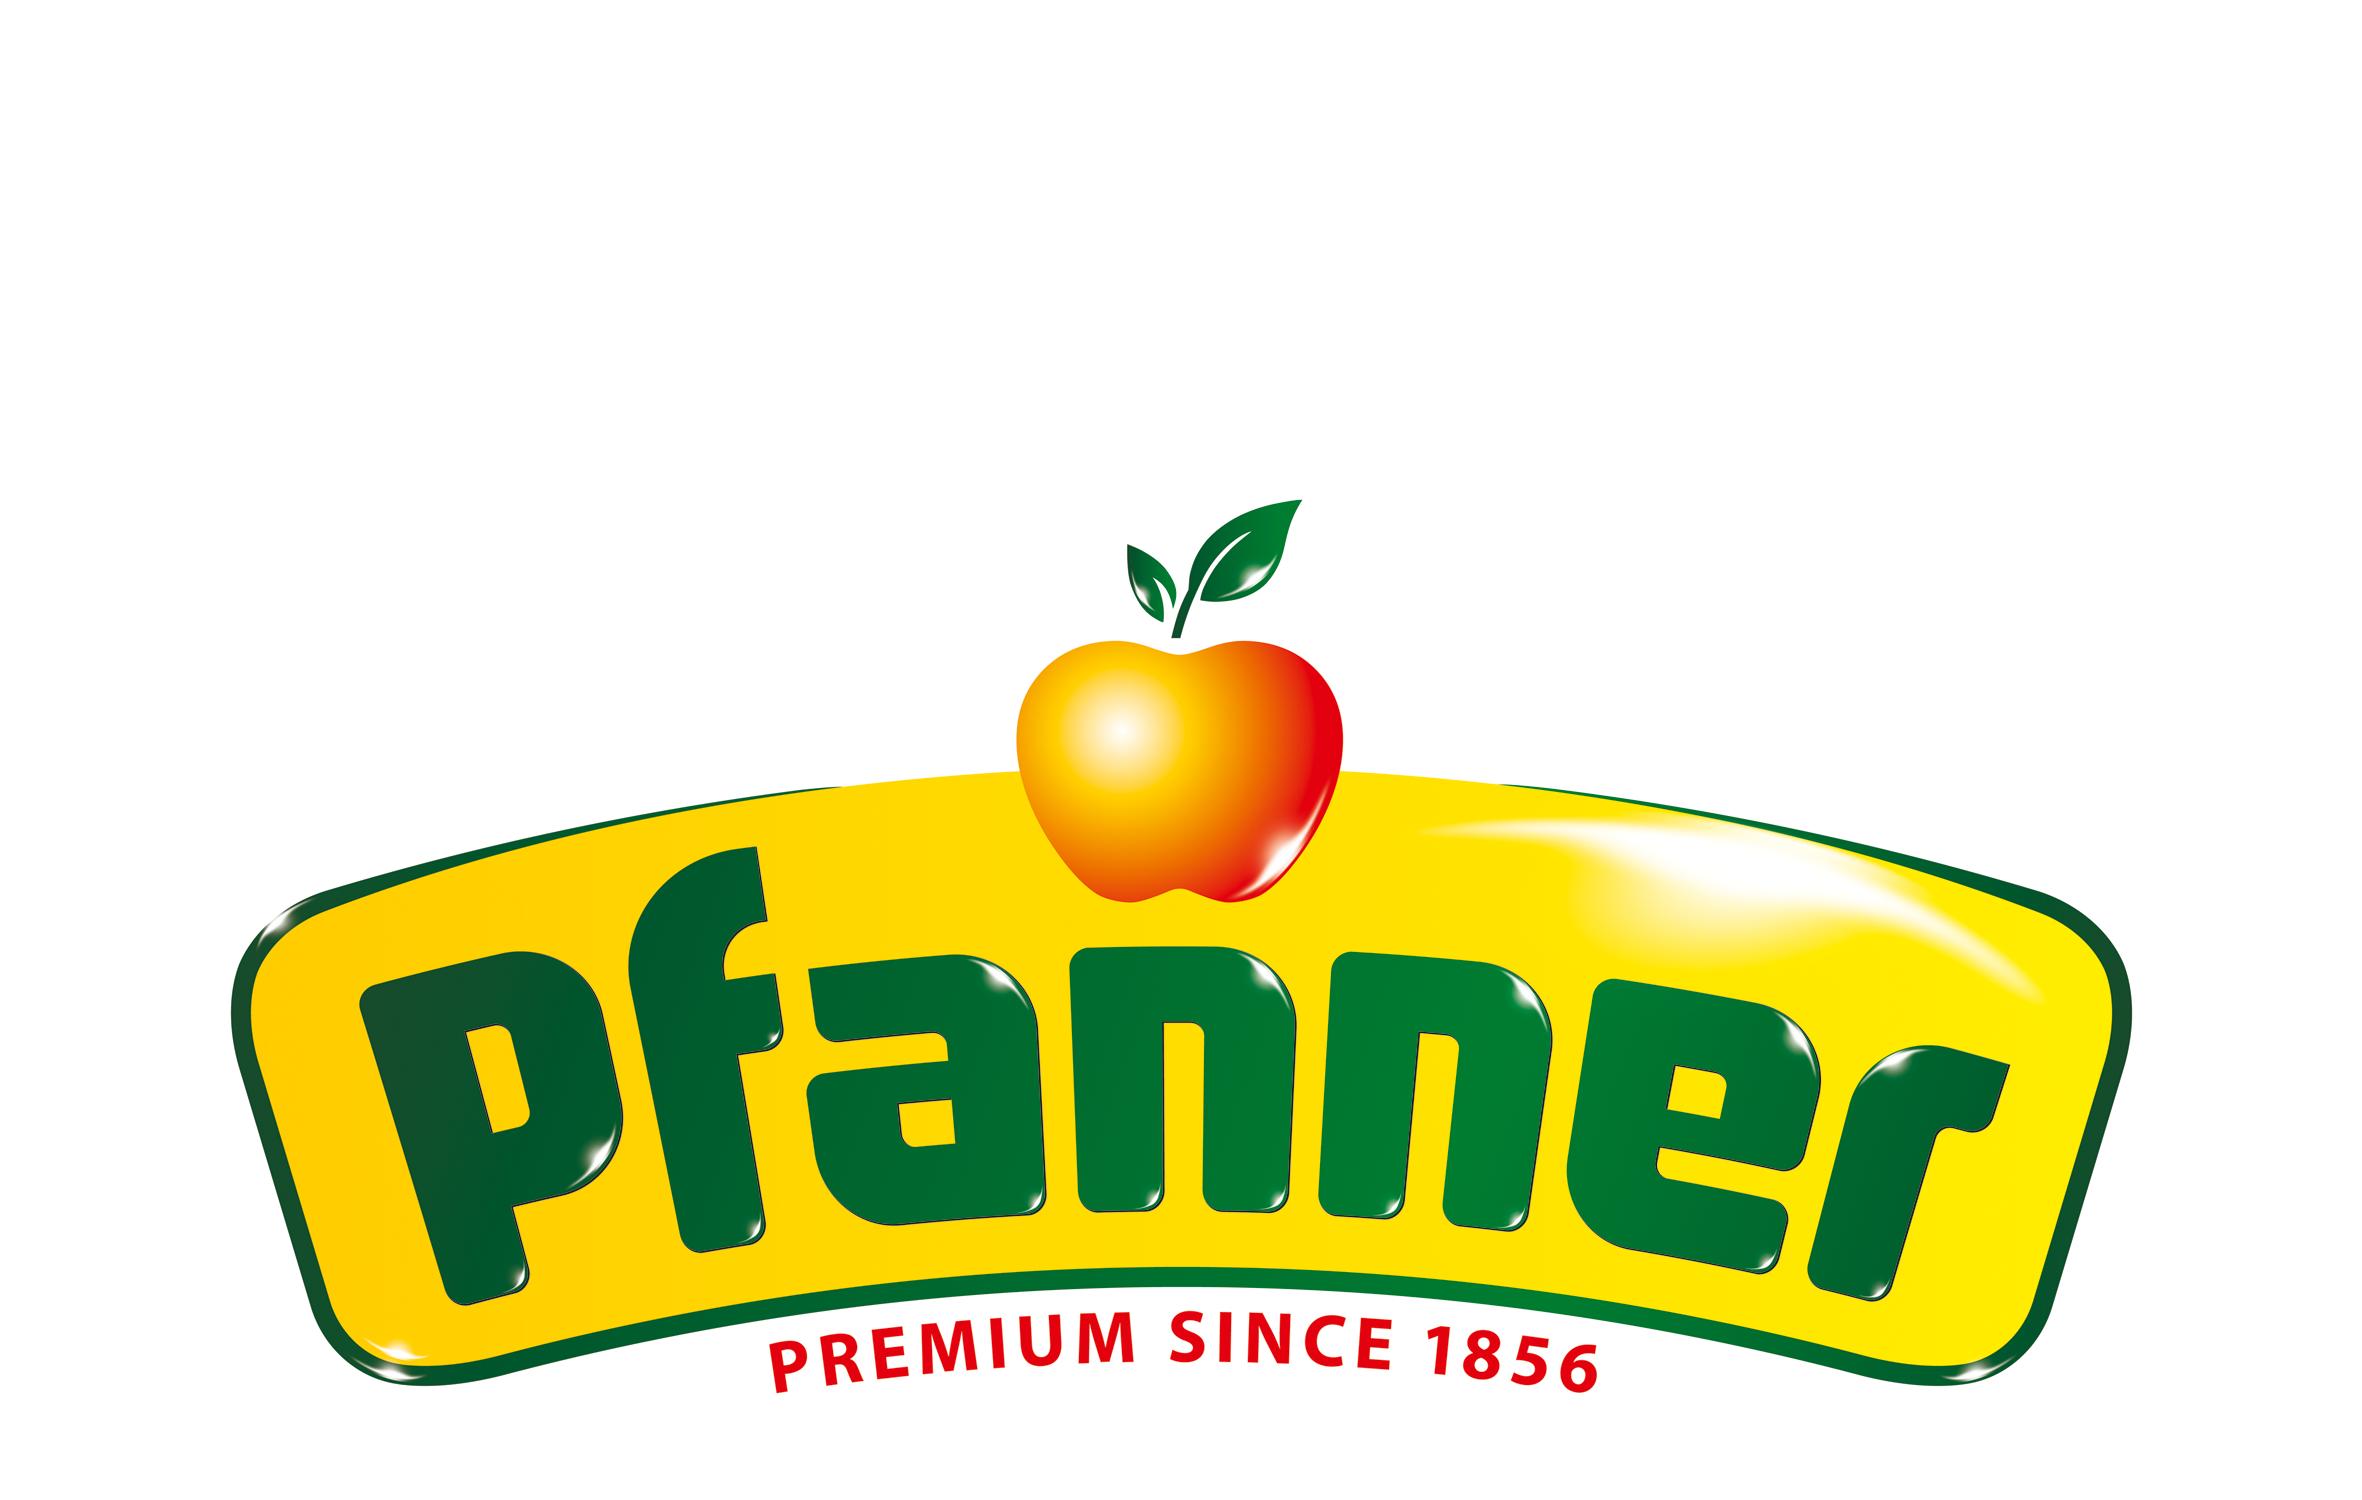 Fruchtsaft machen kann er der Pfanner